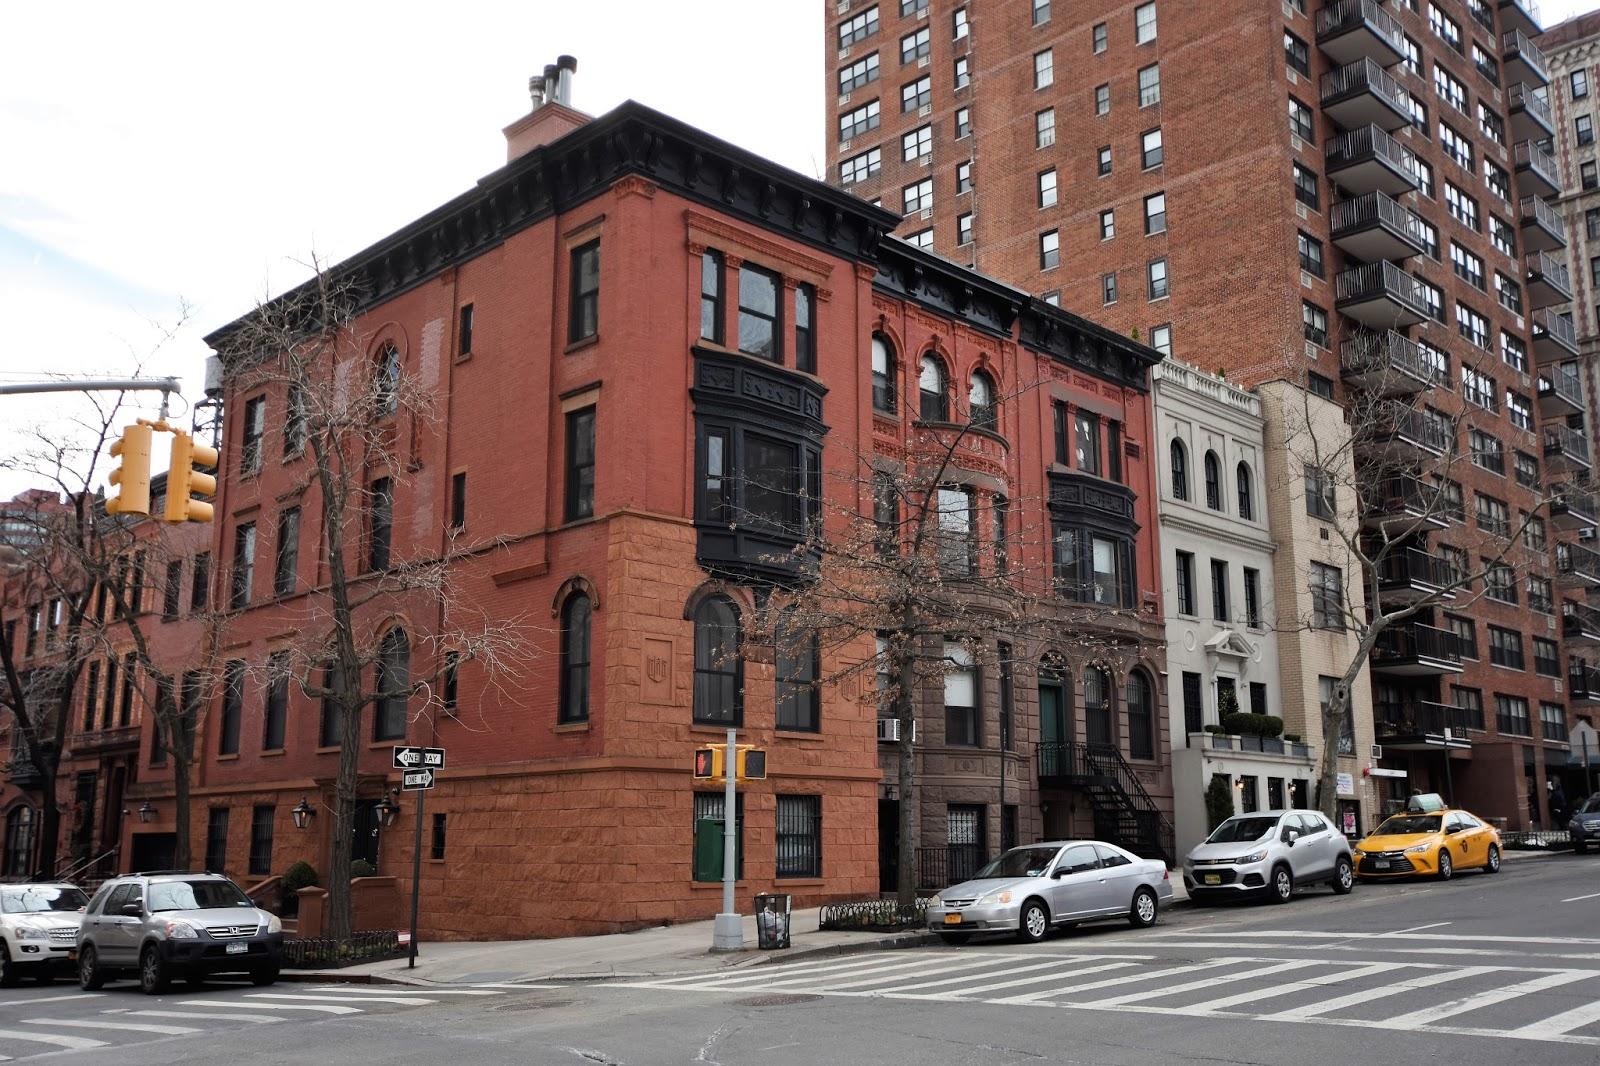 Daytonian in Manhattan: The Dore Lyon House - No 1217 Park Avenue